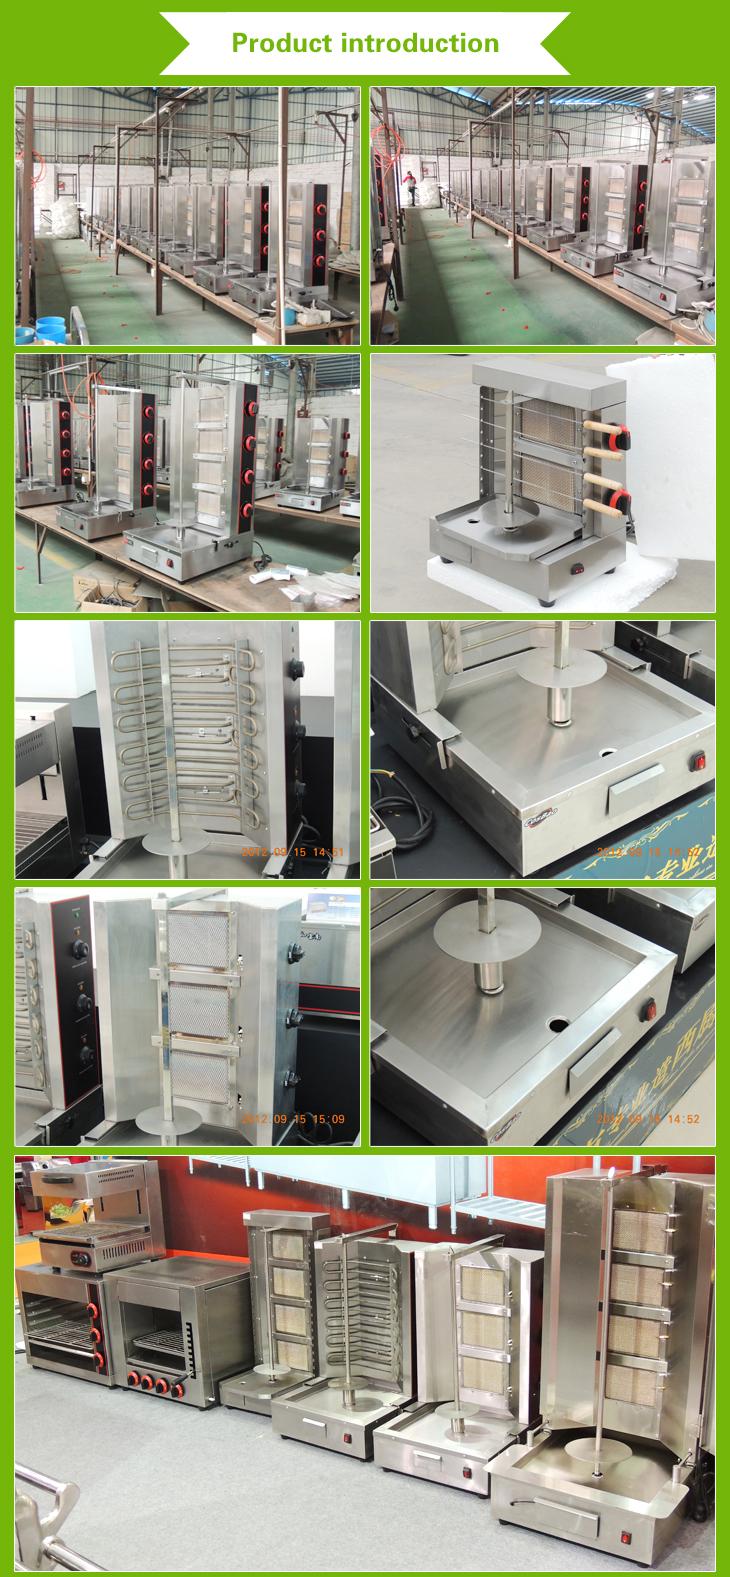 Cosbao names of kitchen equipments restaurant equipment 900 600 view - Infrared Gas Kebab Doner Machine Shawarma Machine For Sale Bn Rg05